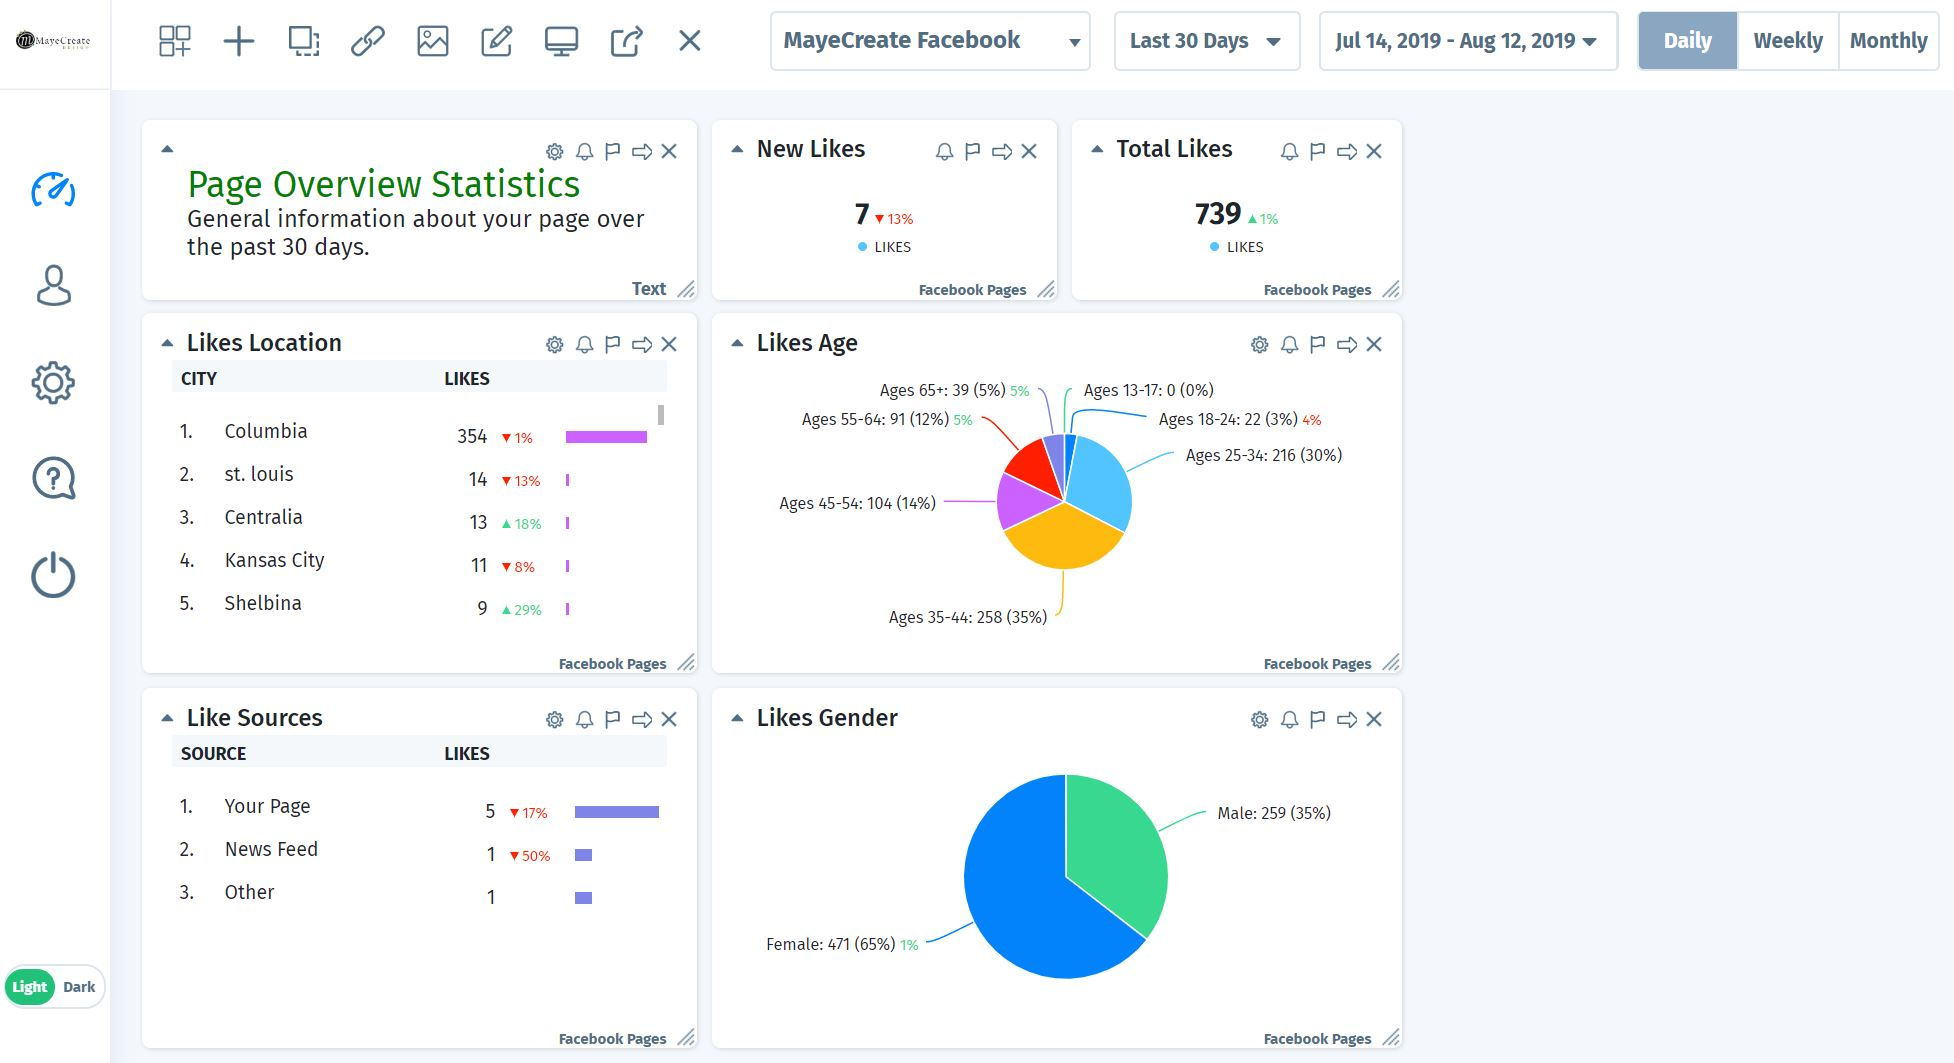 Social Media Management for Nonprofits - Cyfe Dashboard